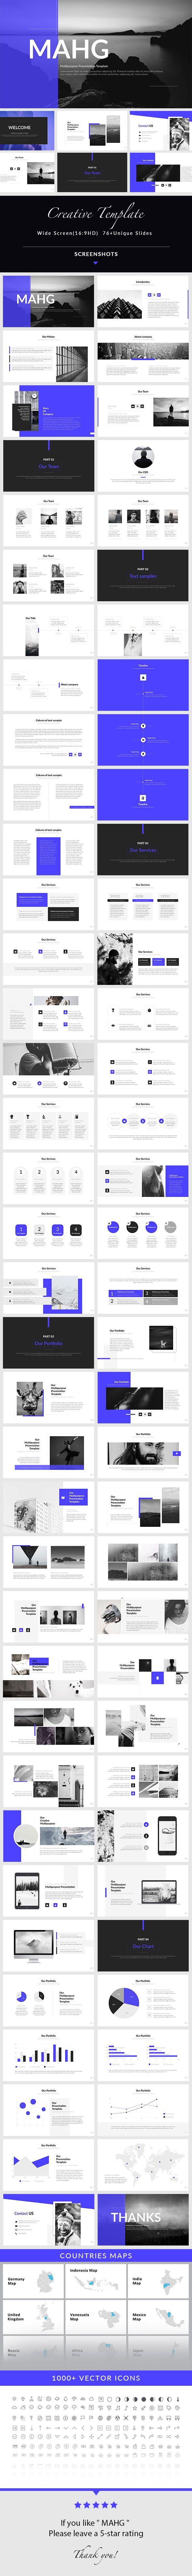 MAHG - #PowerPoint #Presentation Template - Creative PowerPoint Templates